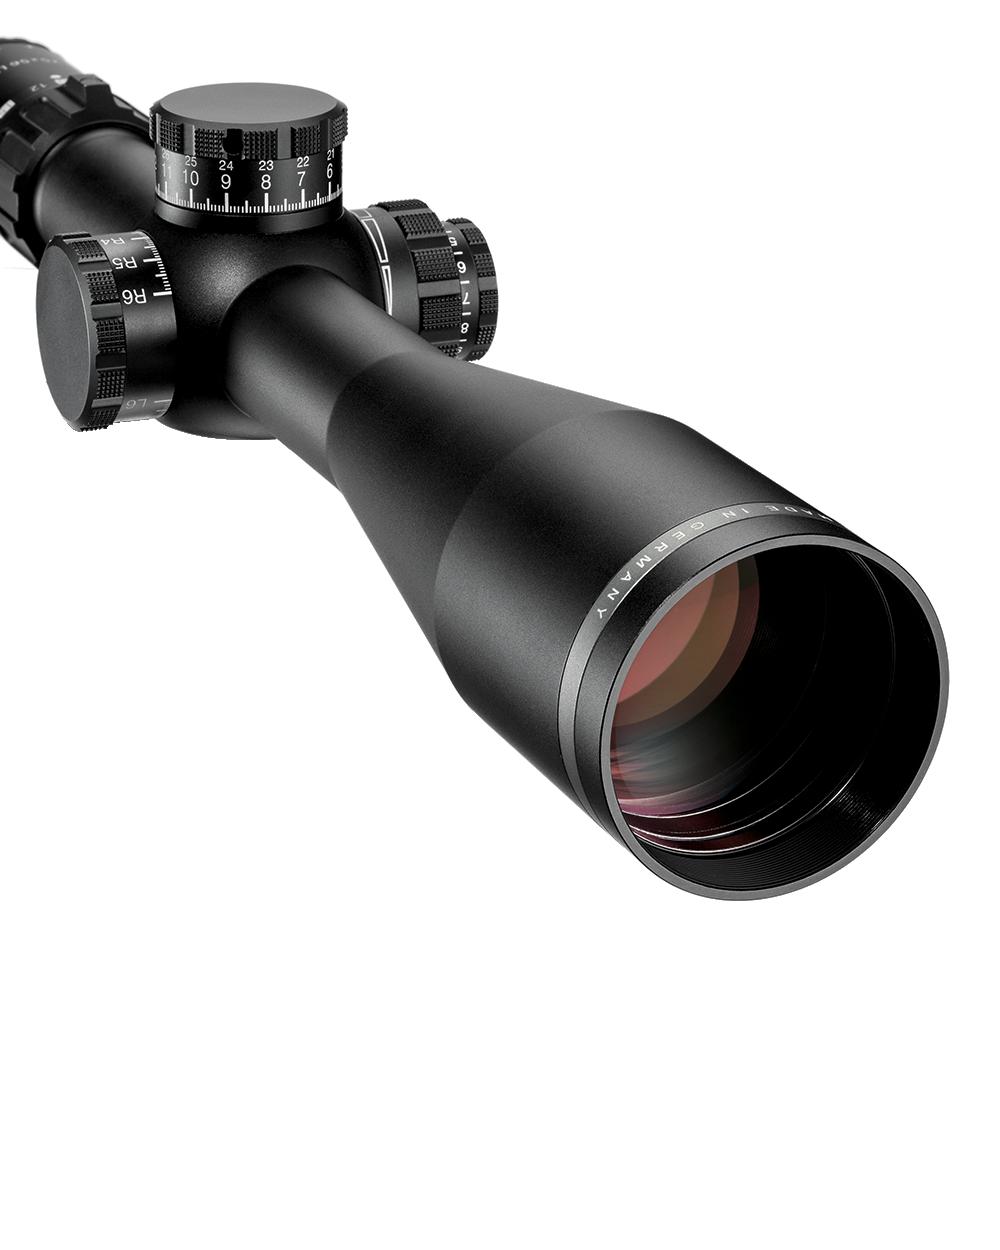 MINOX Zielfernrohr Long Range 5-25x56